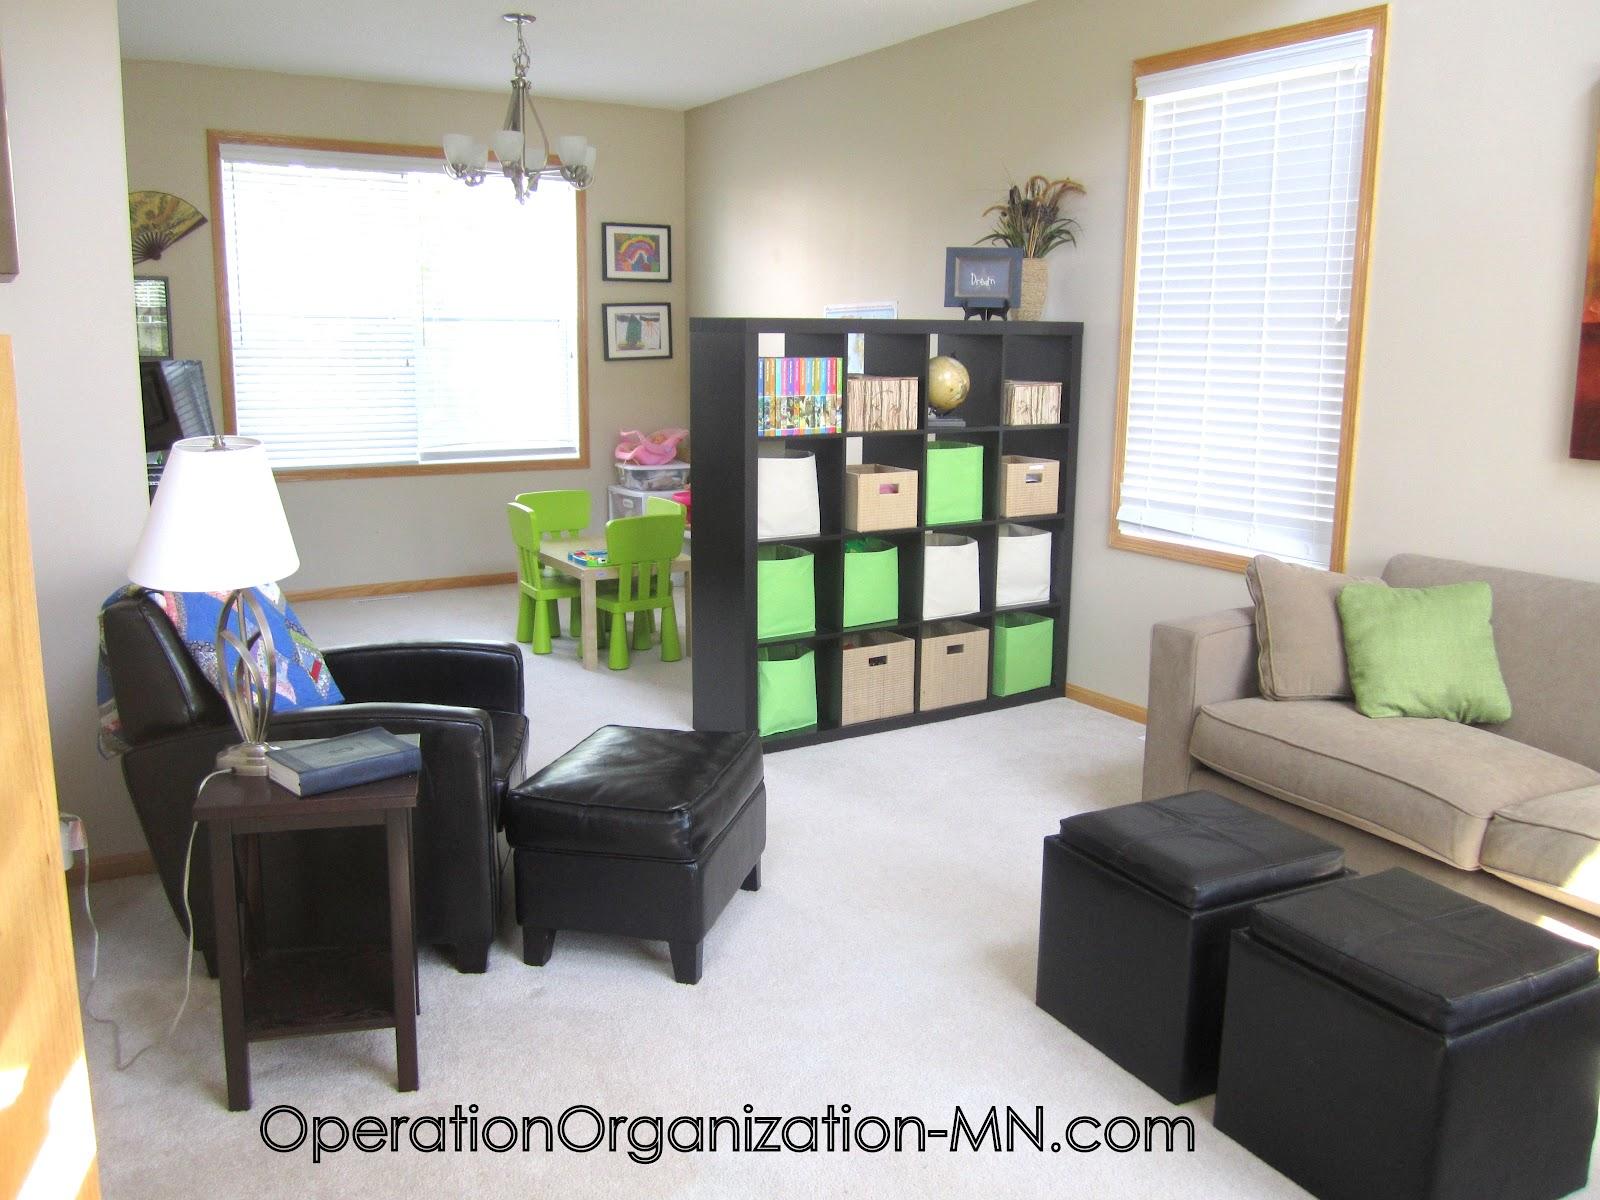 Small Living Room Organization Ideas | Home Decor Ideas